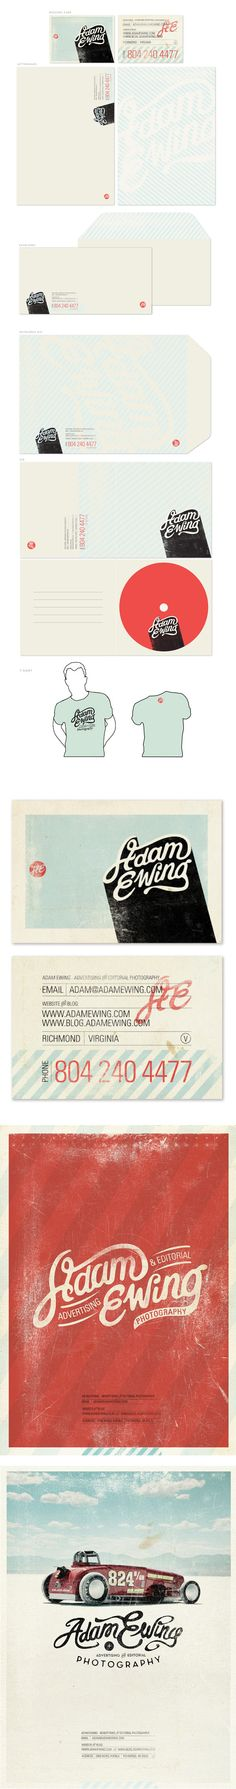 Adam Ewing identity by Alex Ramon